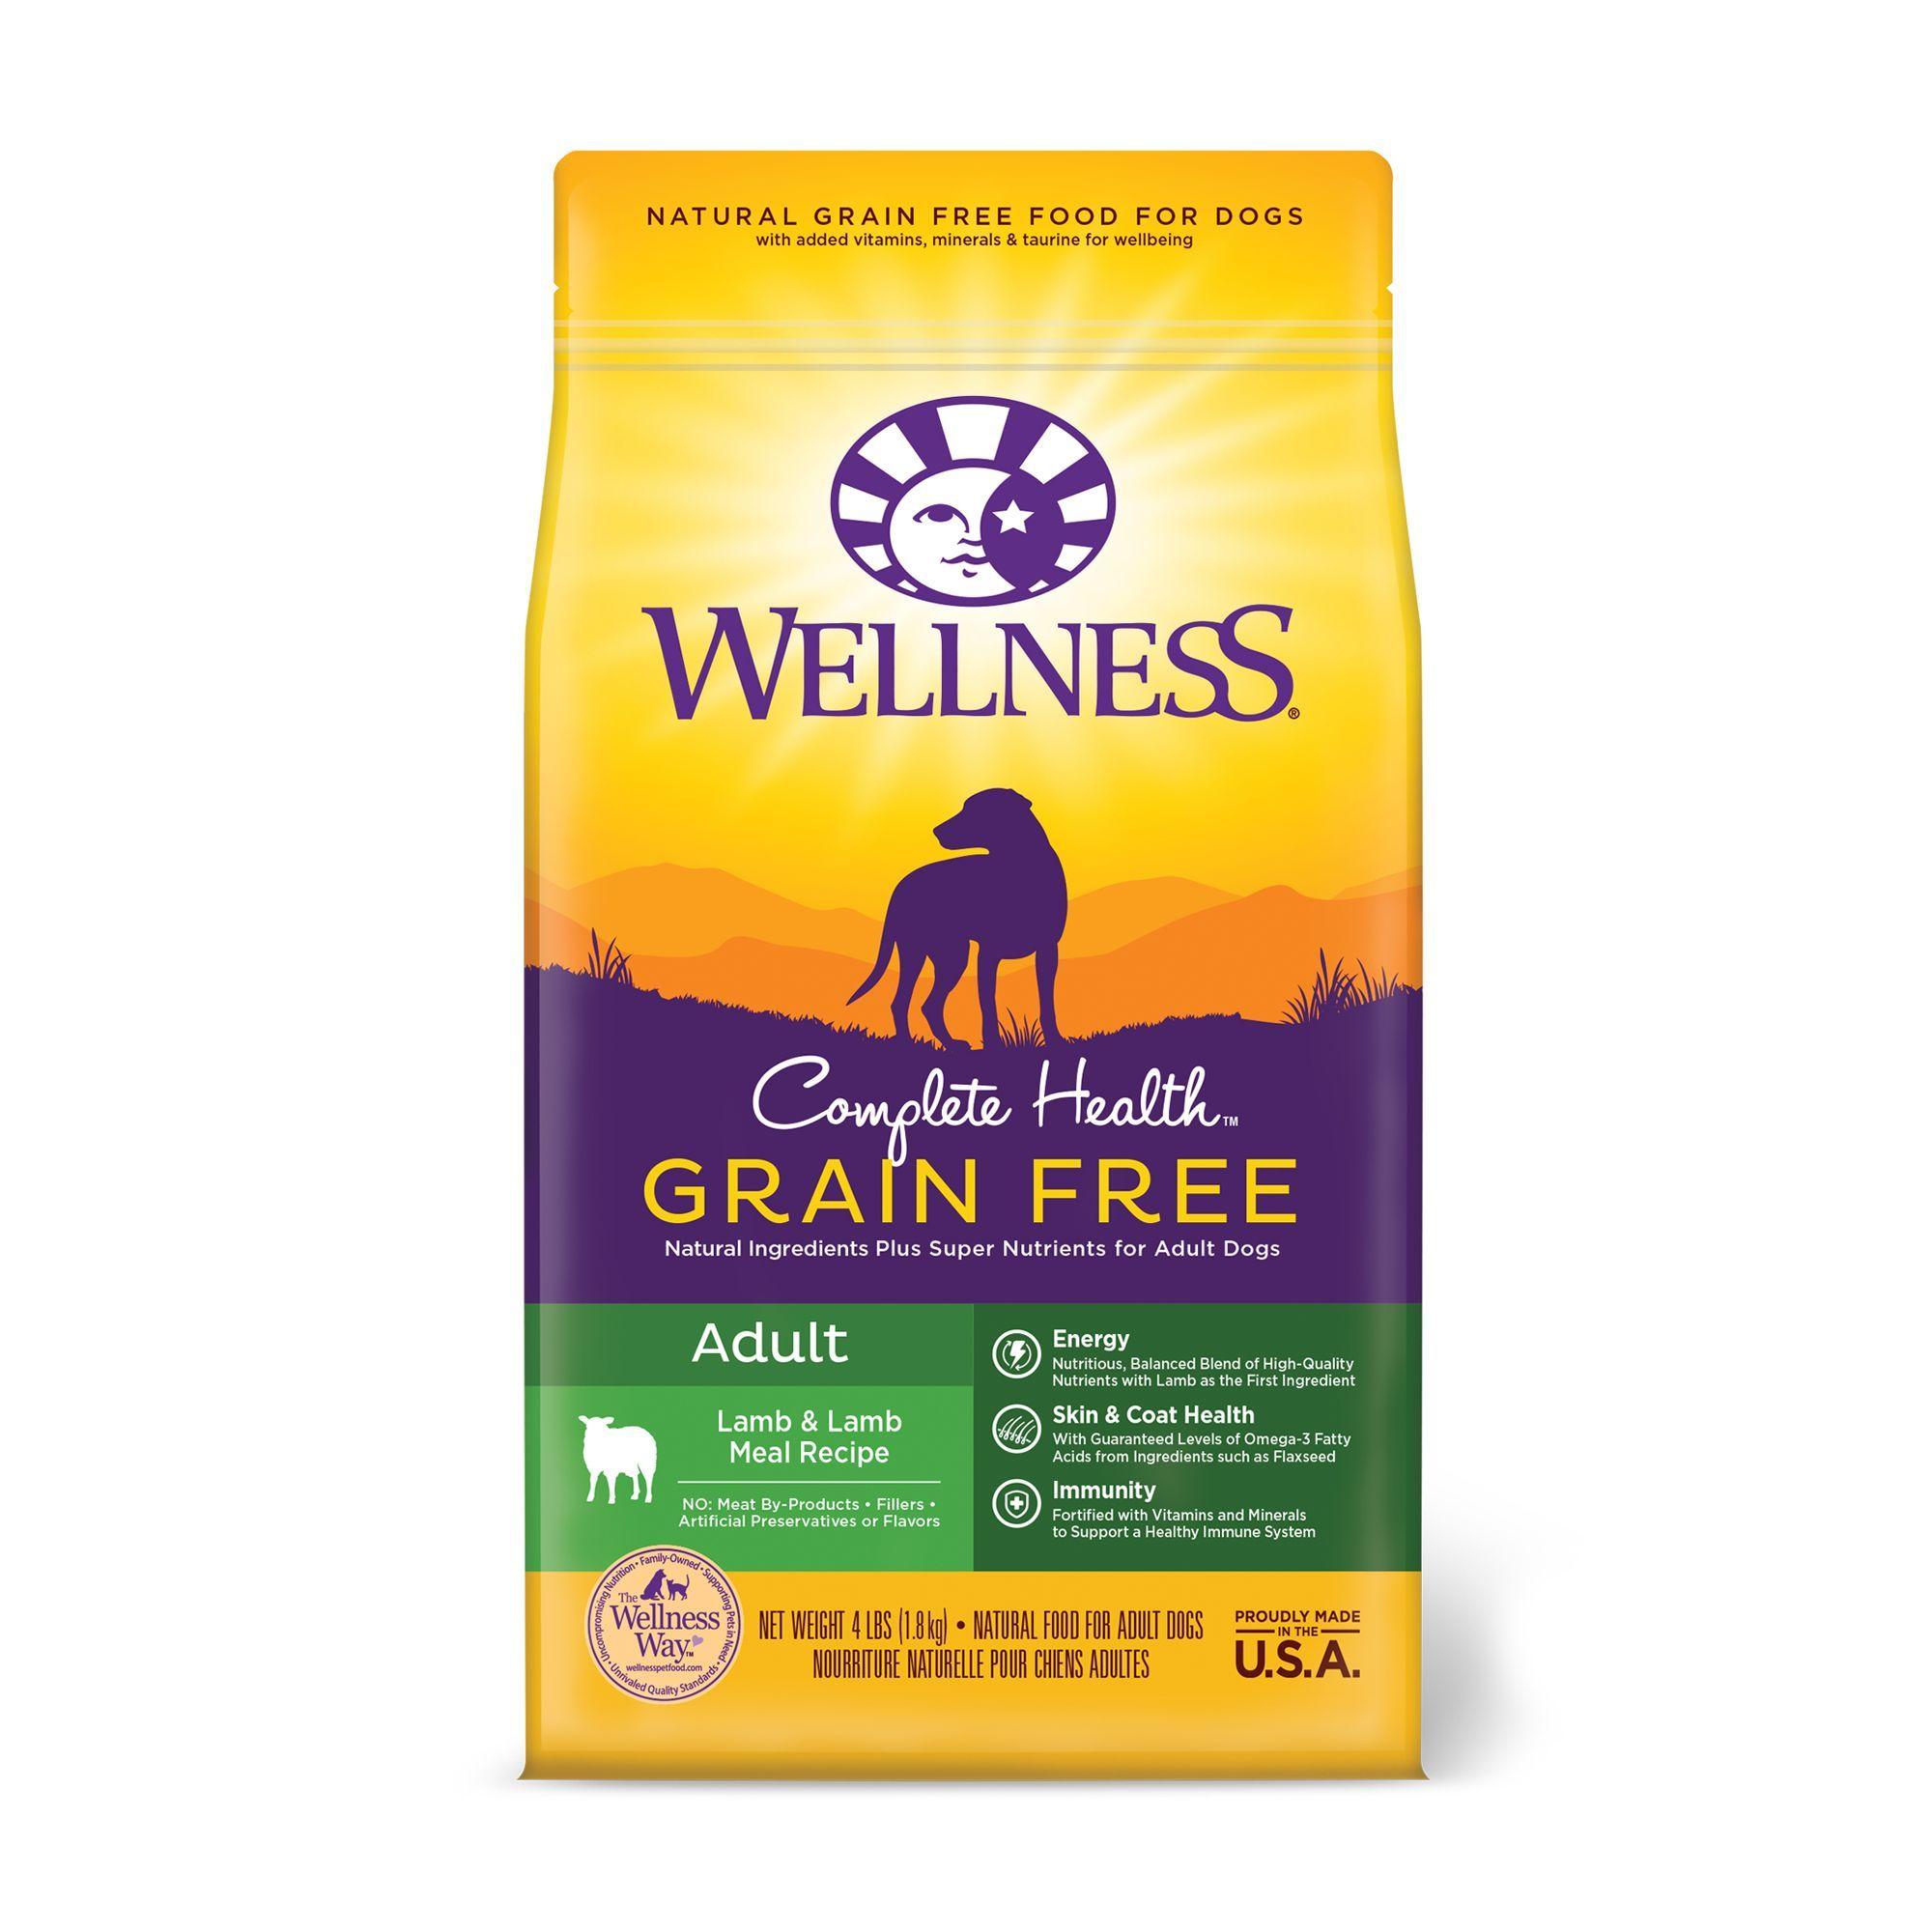 Wellness Complete Health Adult Dog Food Natural Grain Free